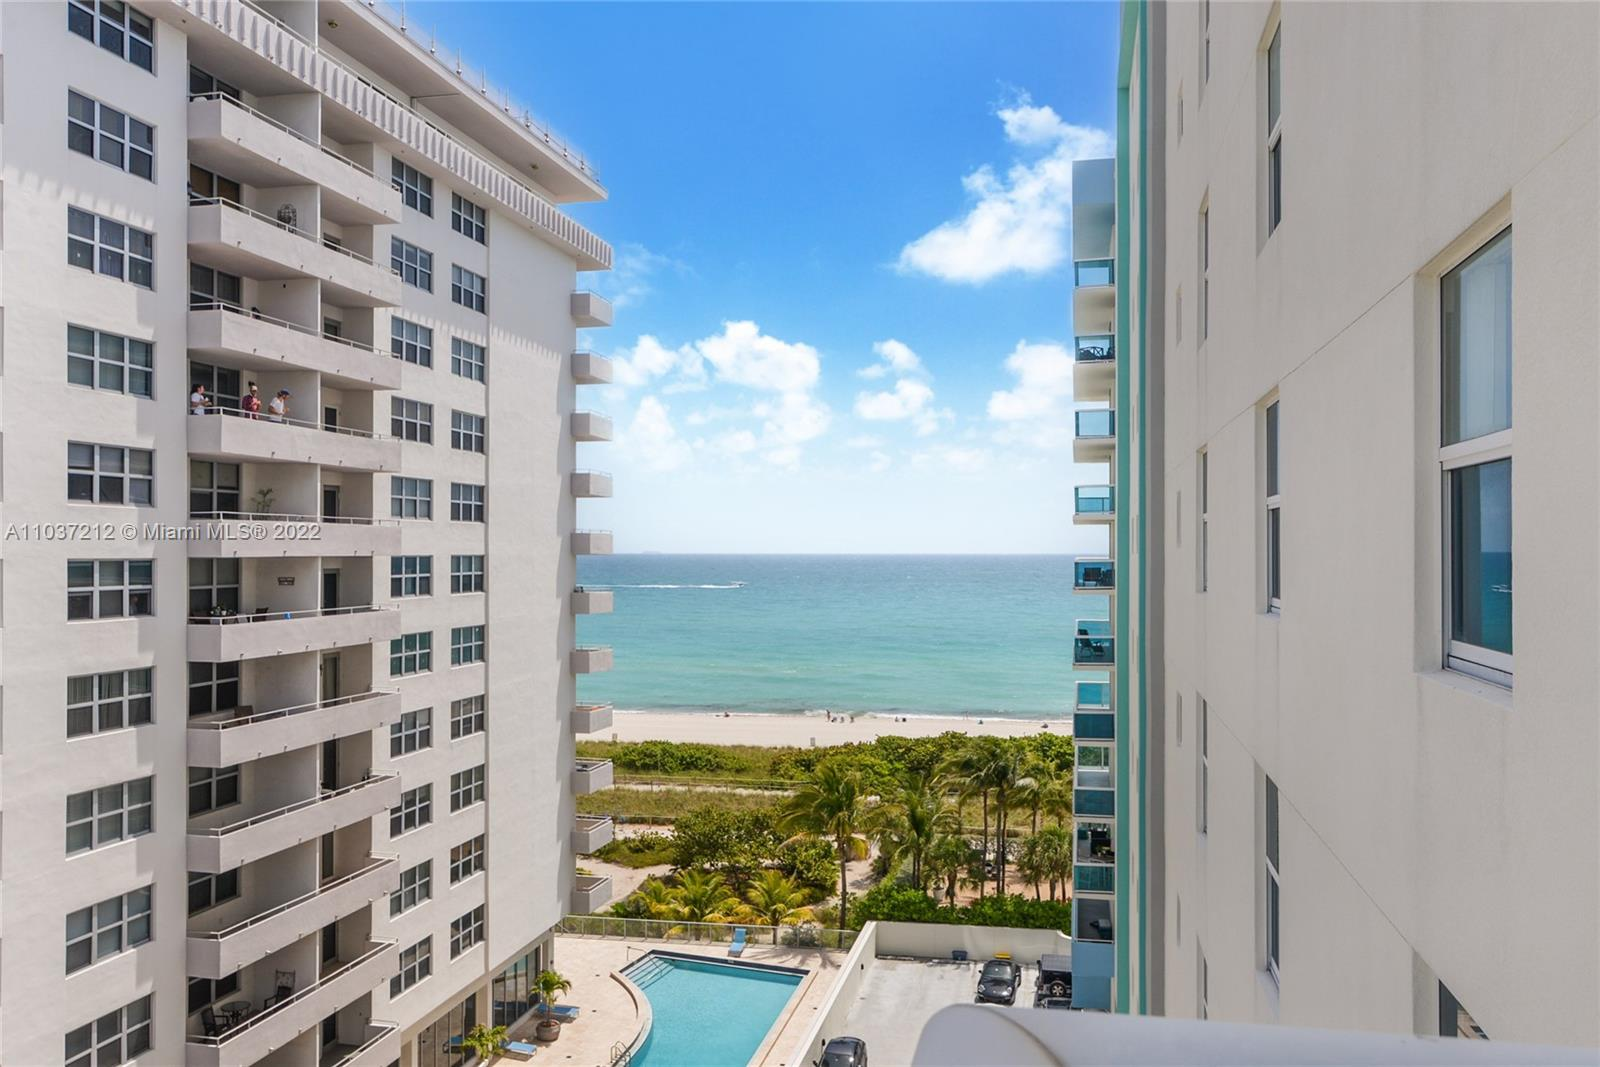 9201 Collins Ave Unit 821, Surfside, Florida 33154